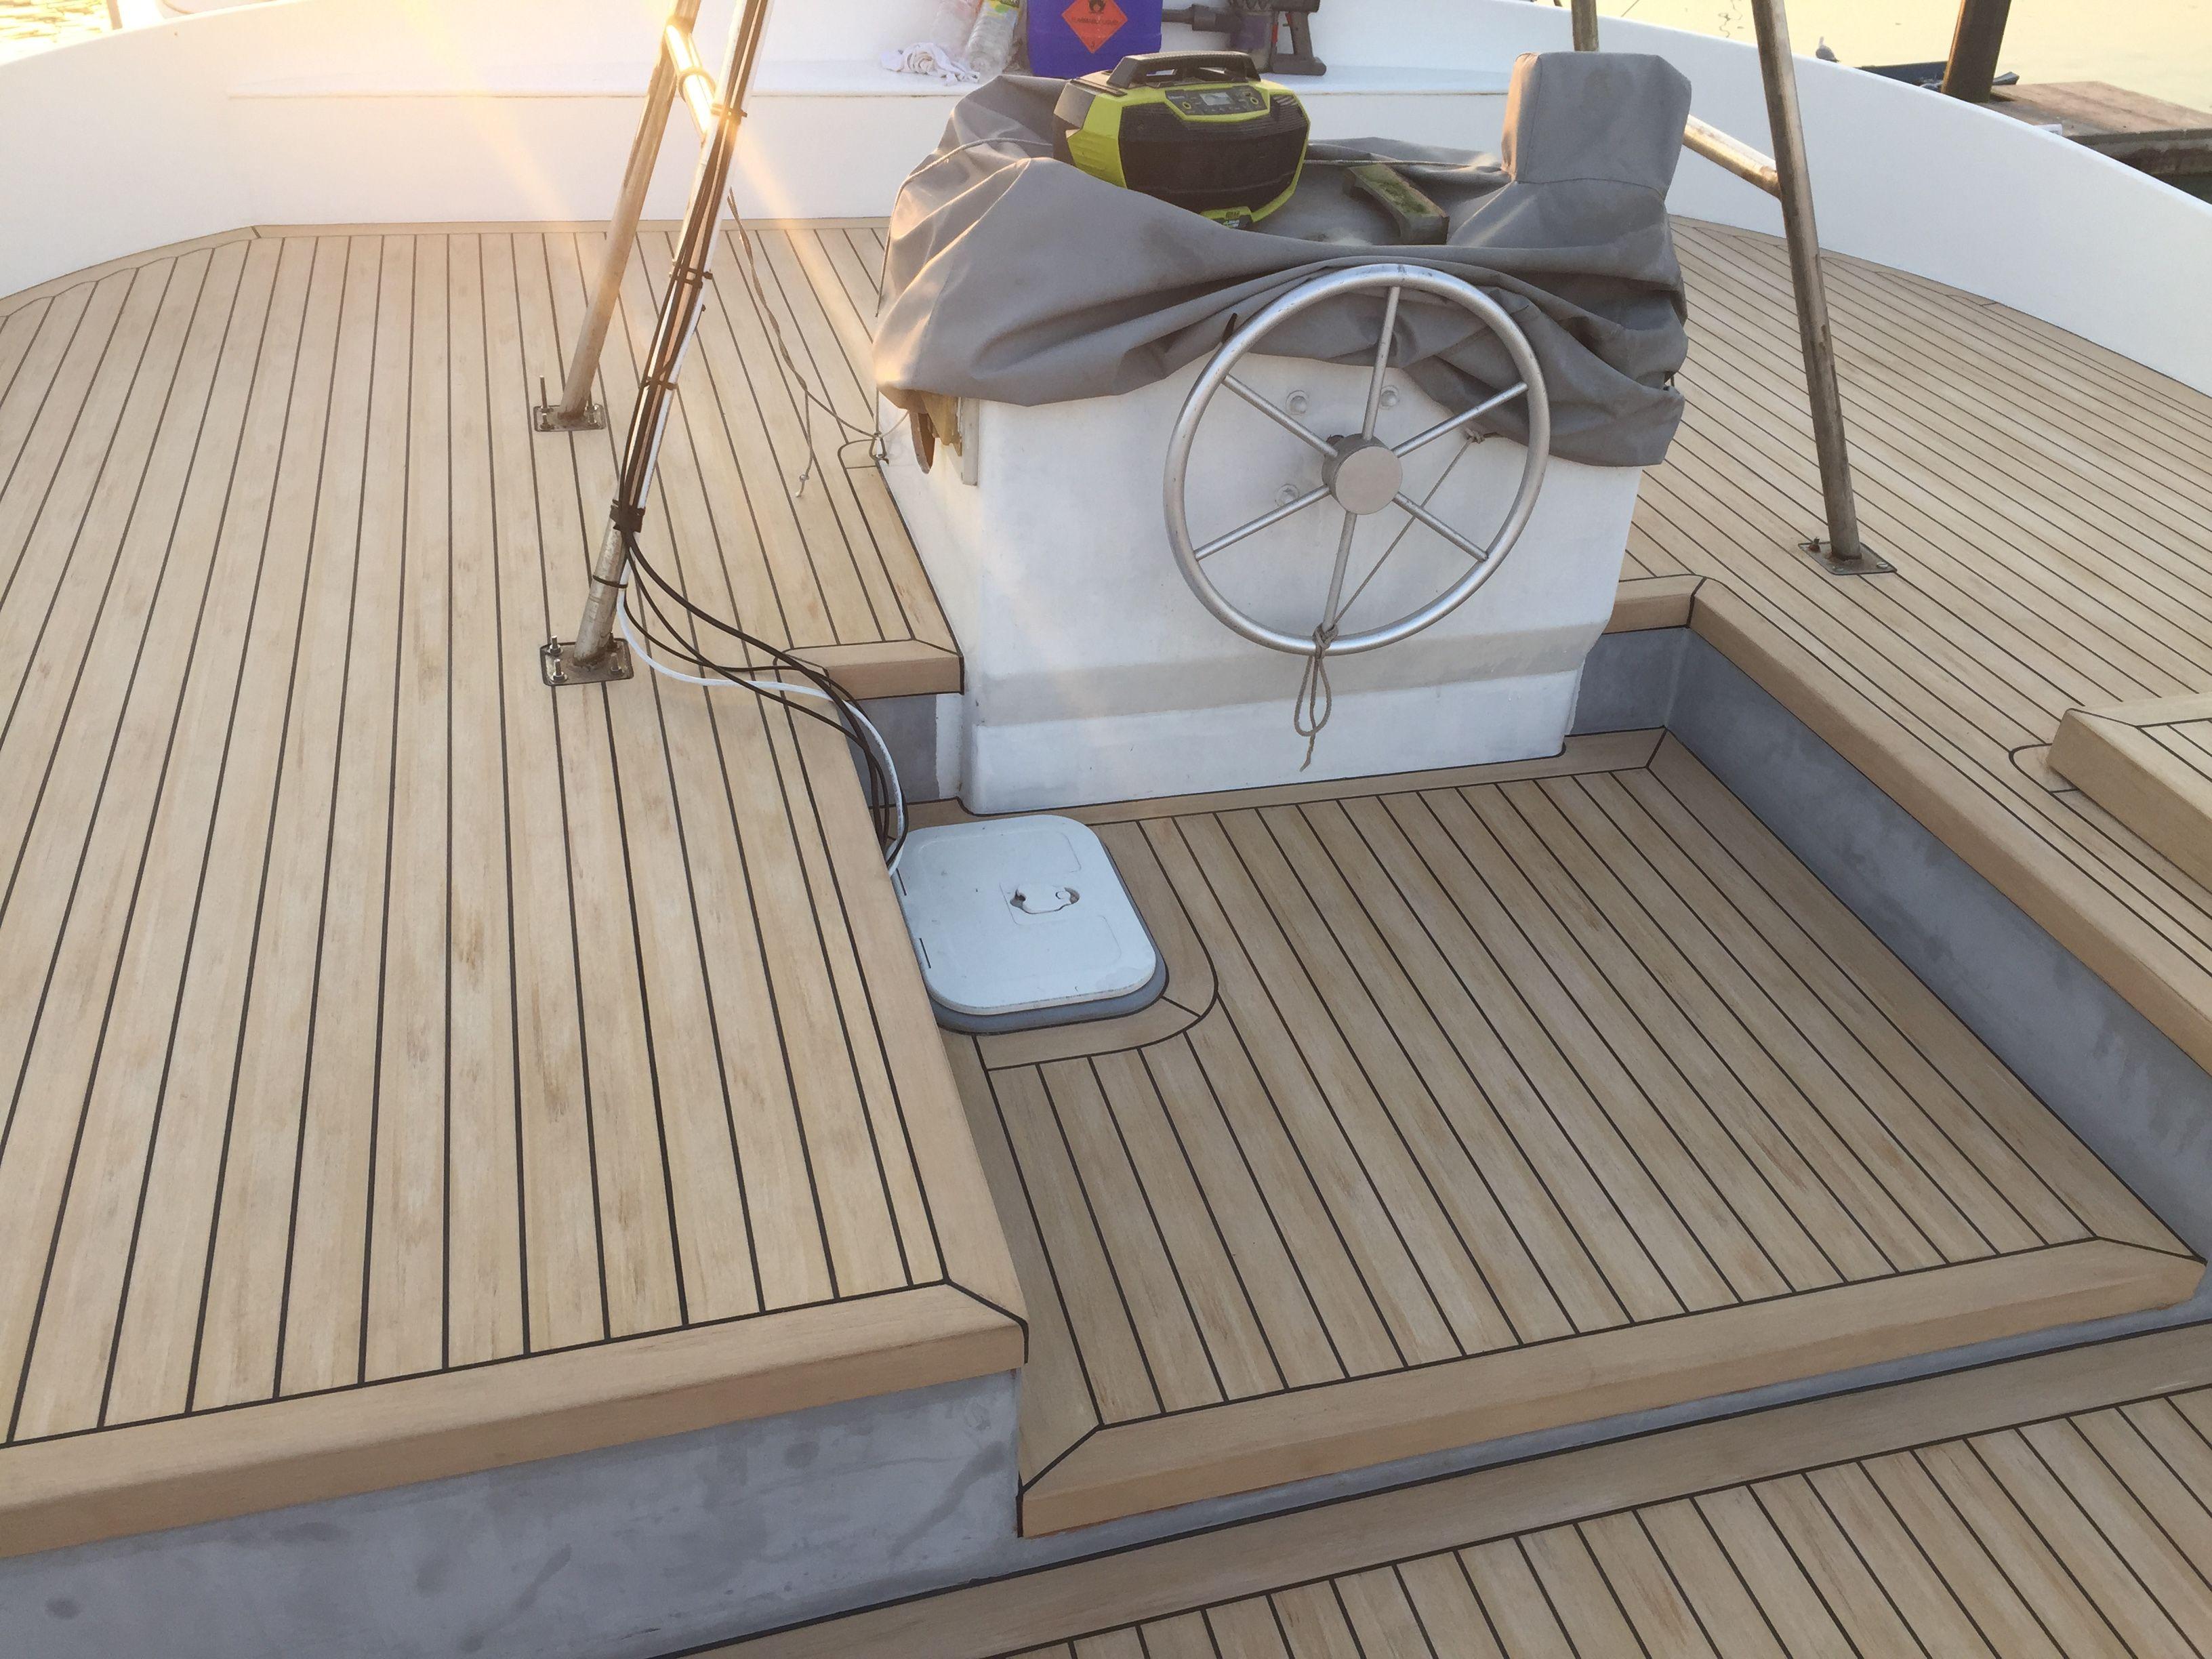 Boat Deck Covering Price Flooring Laminate